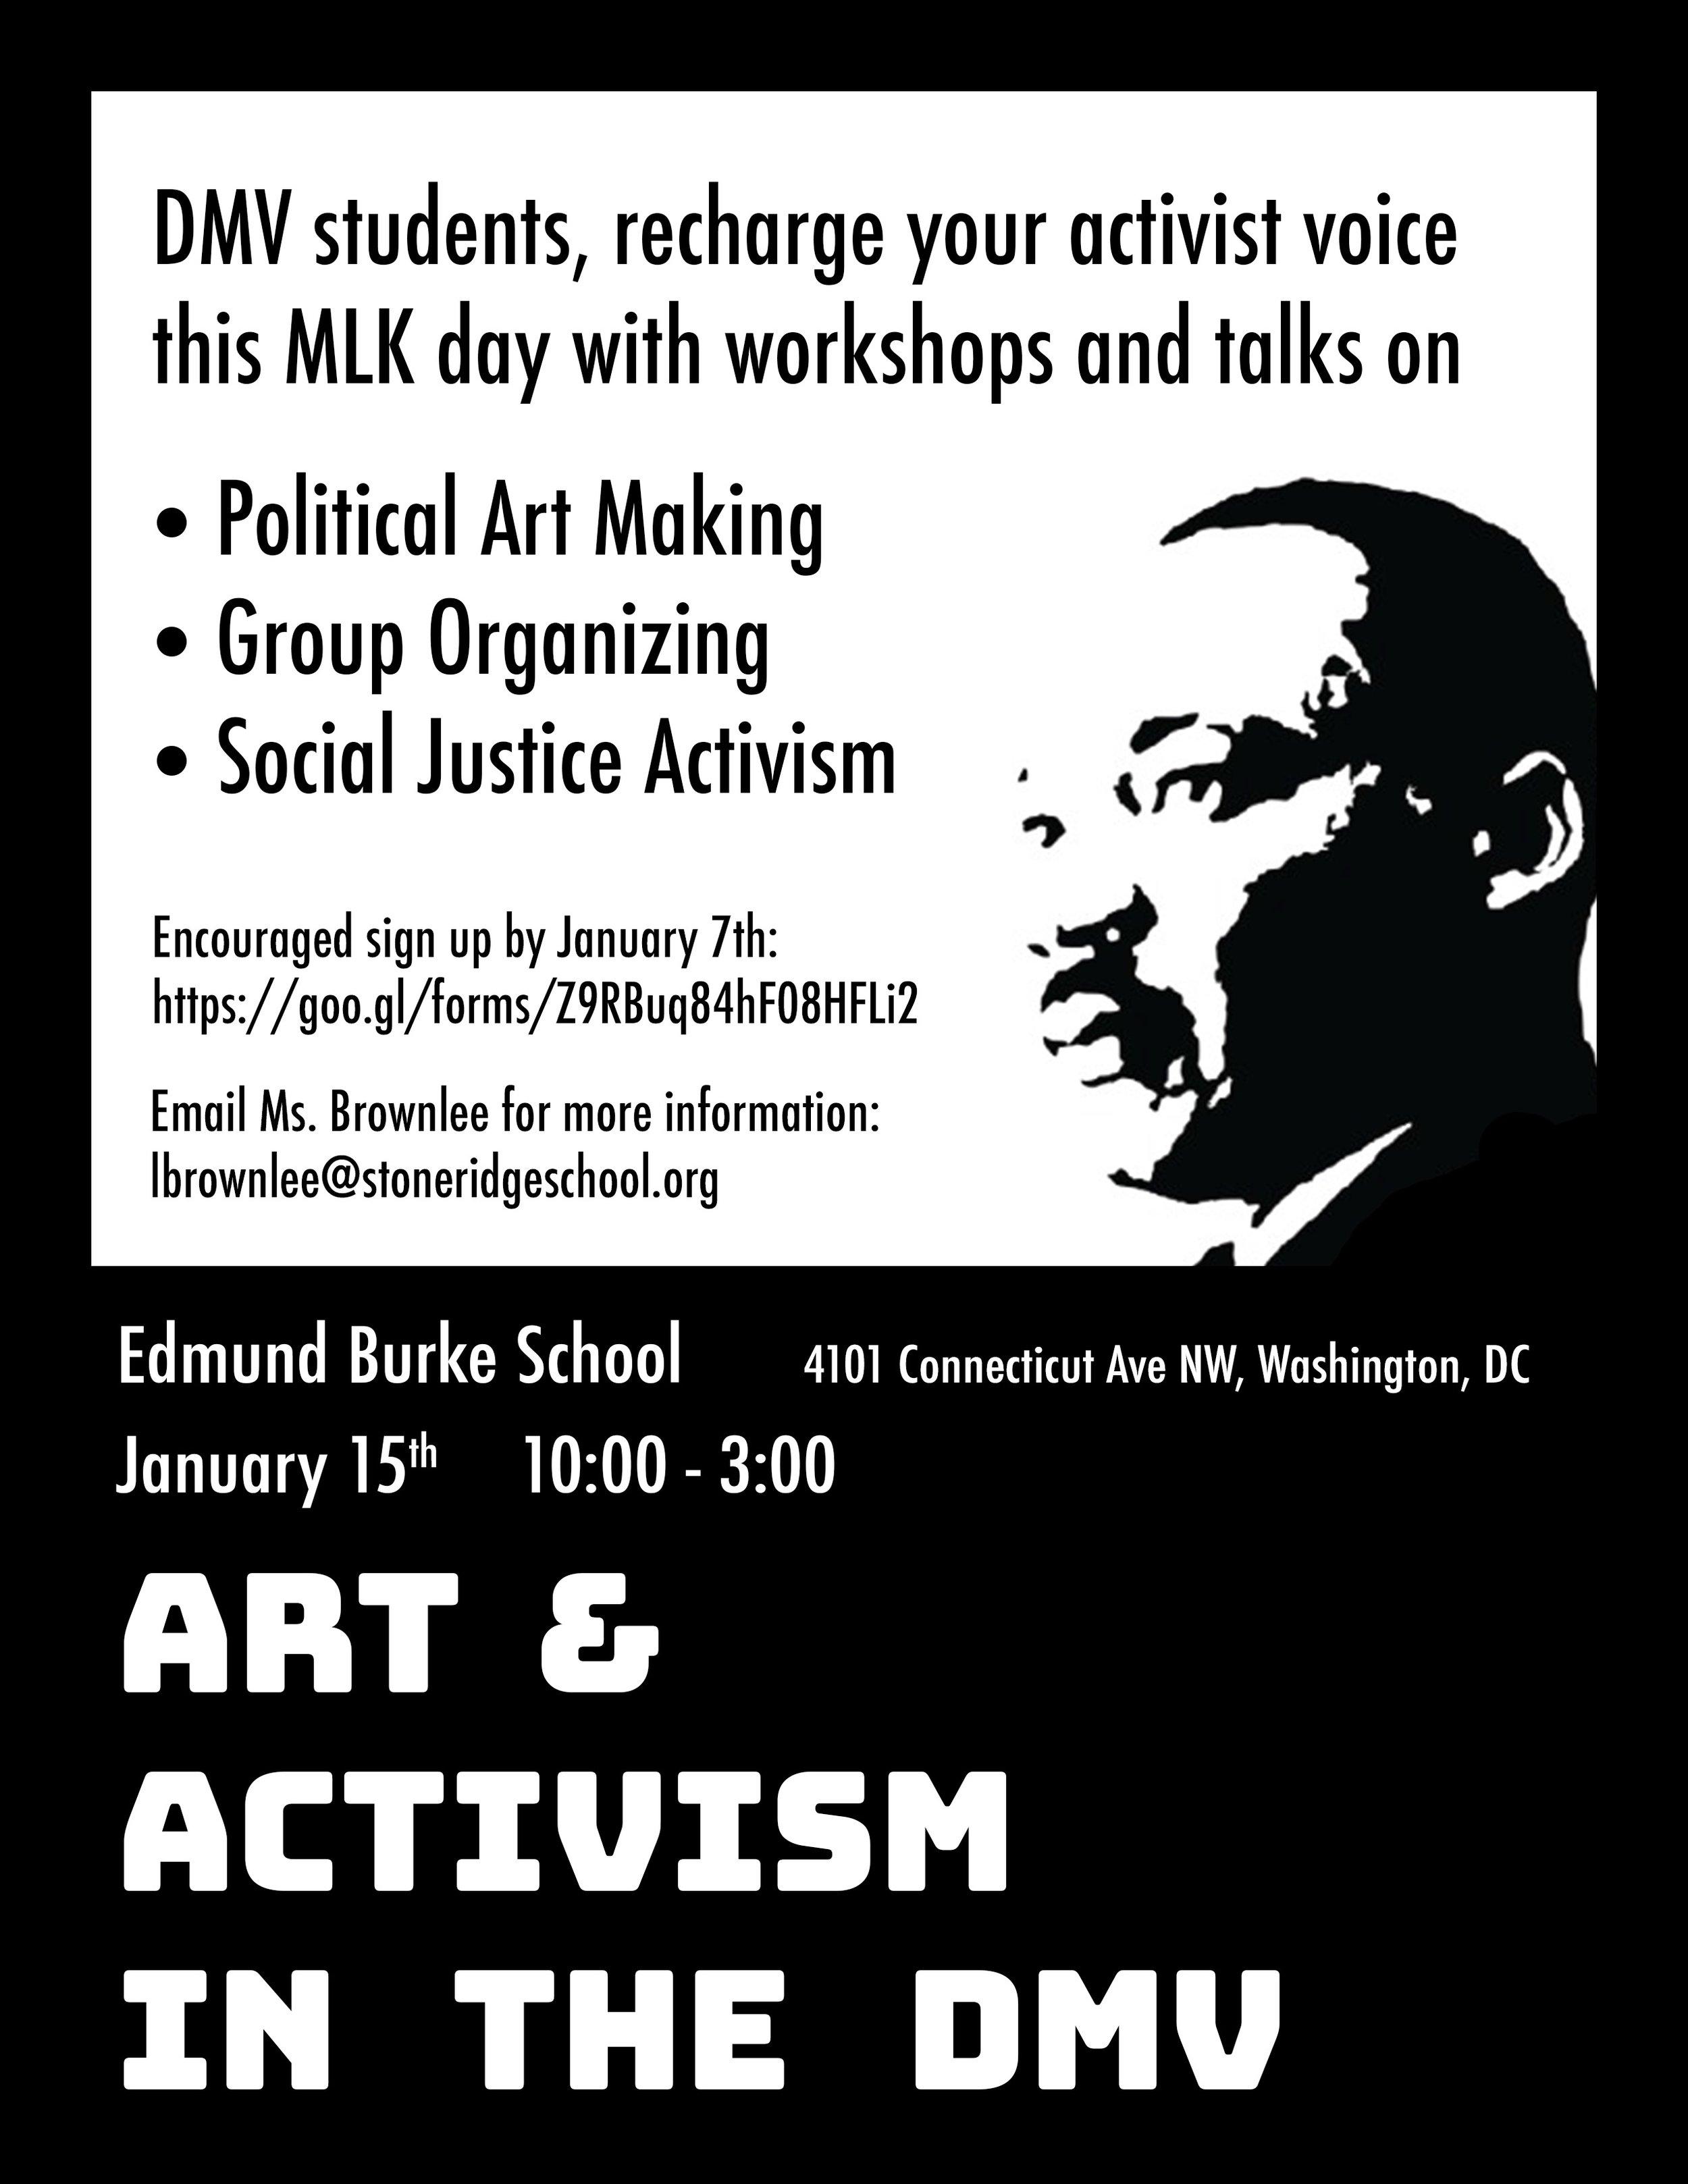 Art&ActivismInTheDMV copy.jpg